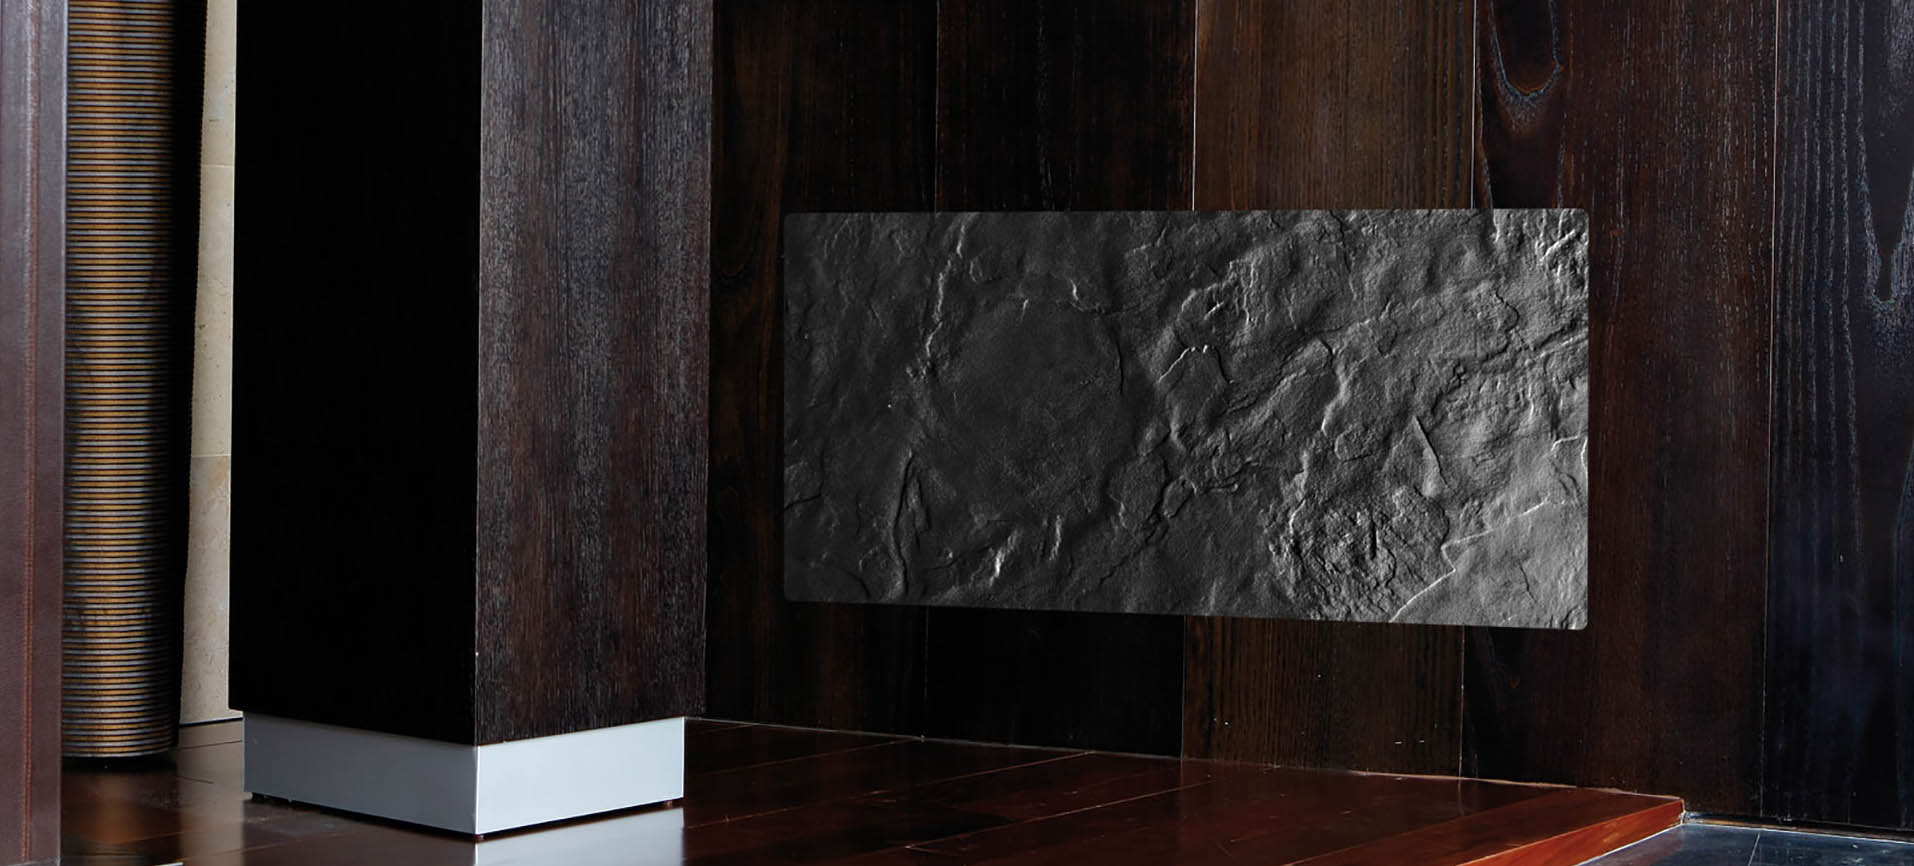 Climastar smart touch kerámia fűtőpanel